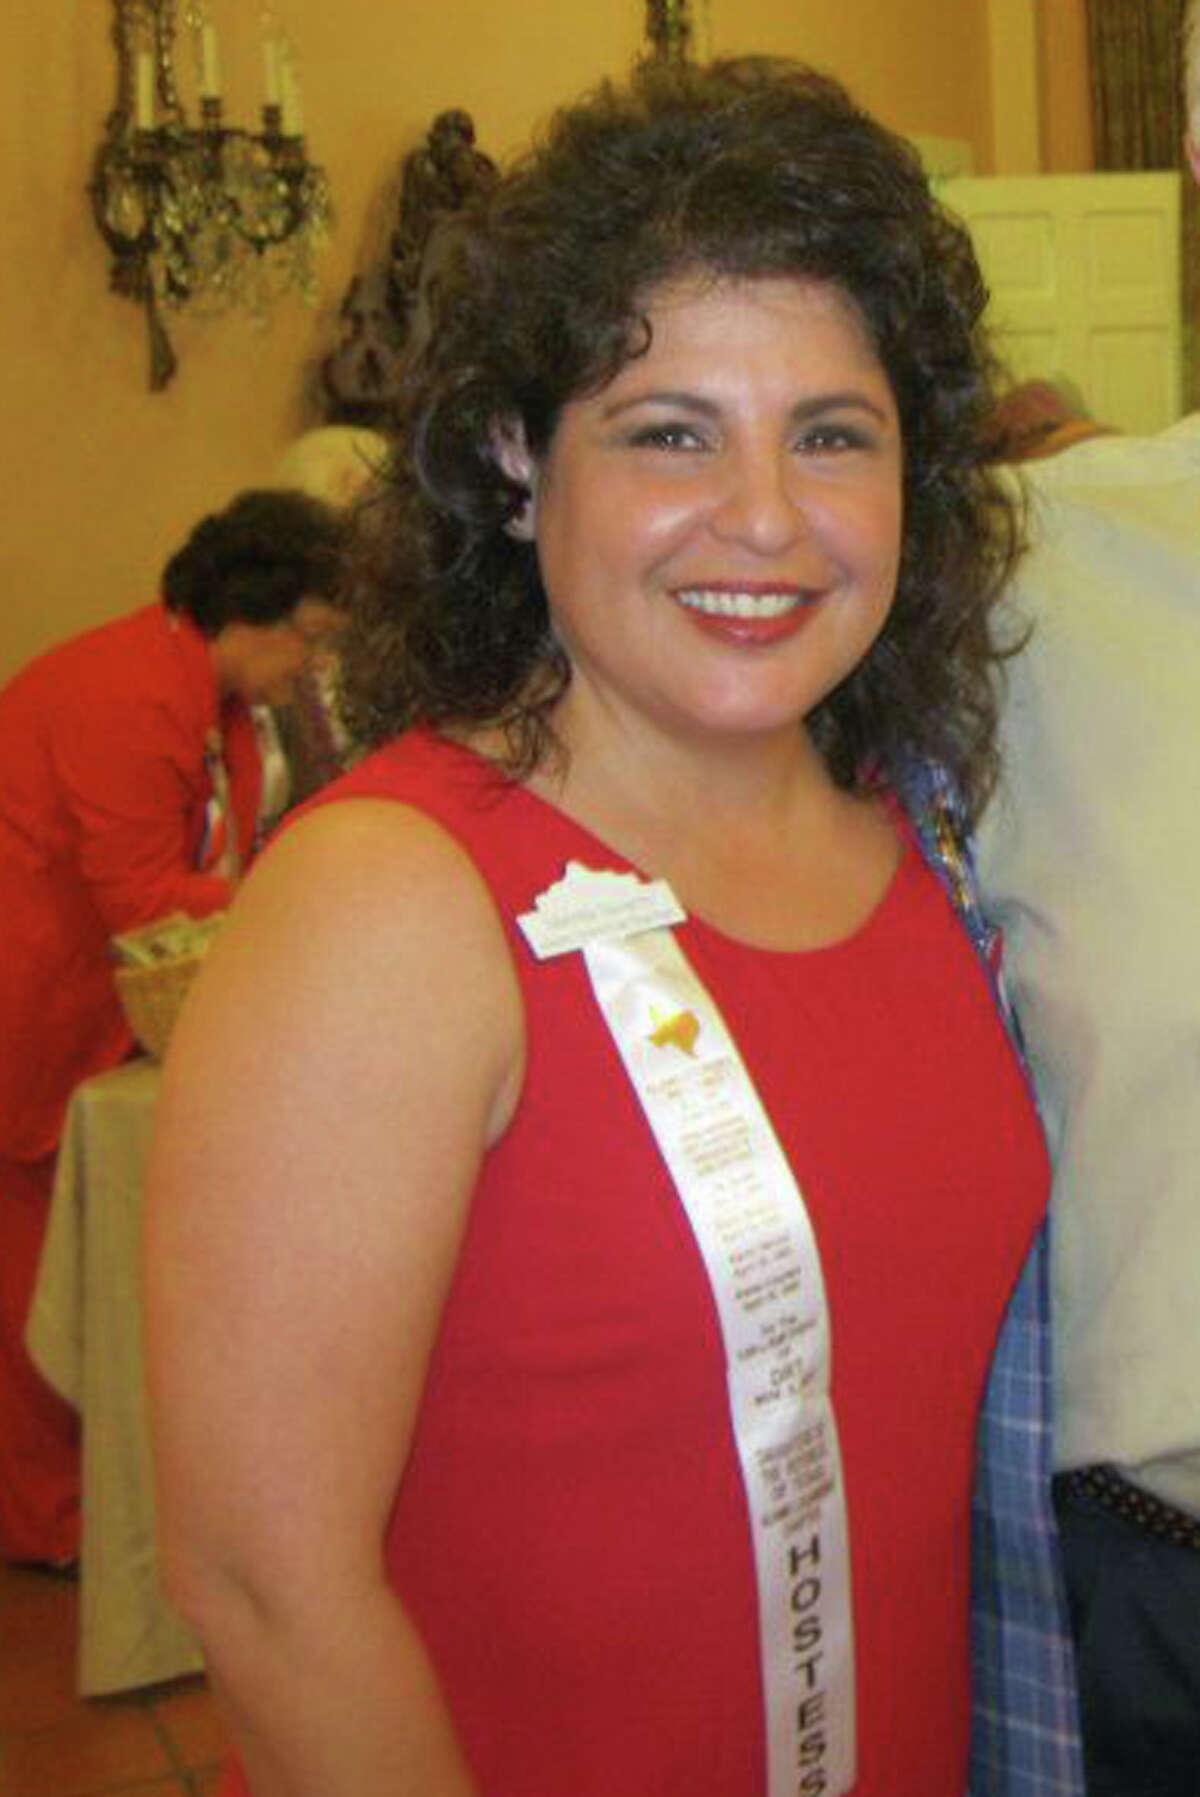 Melinda Tomerlin Navarro is the new interim executive administrator at the Alamo.